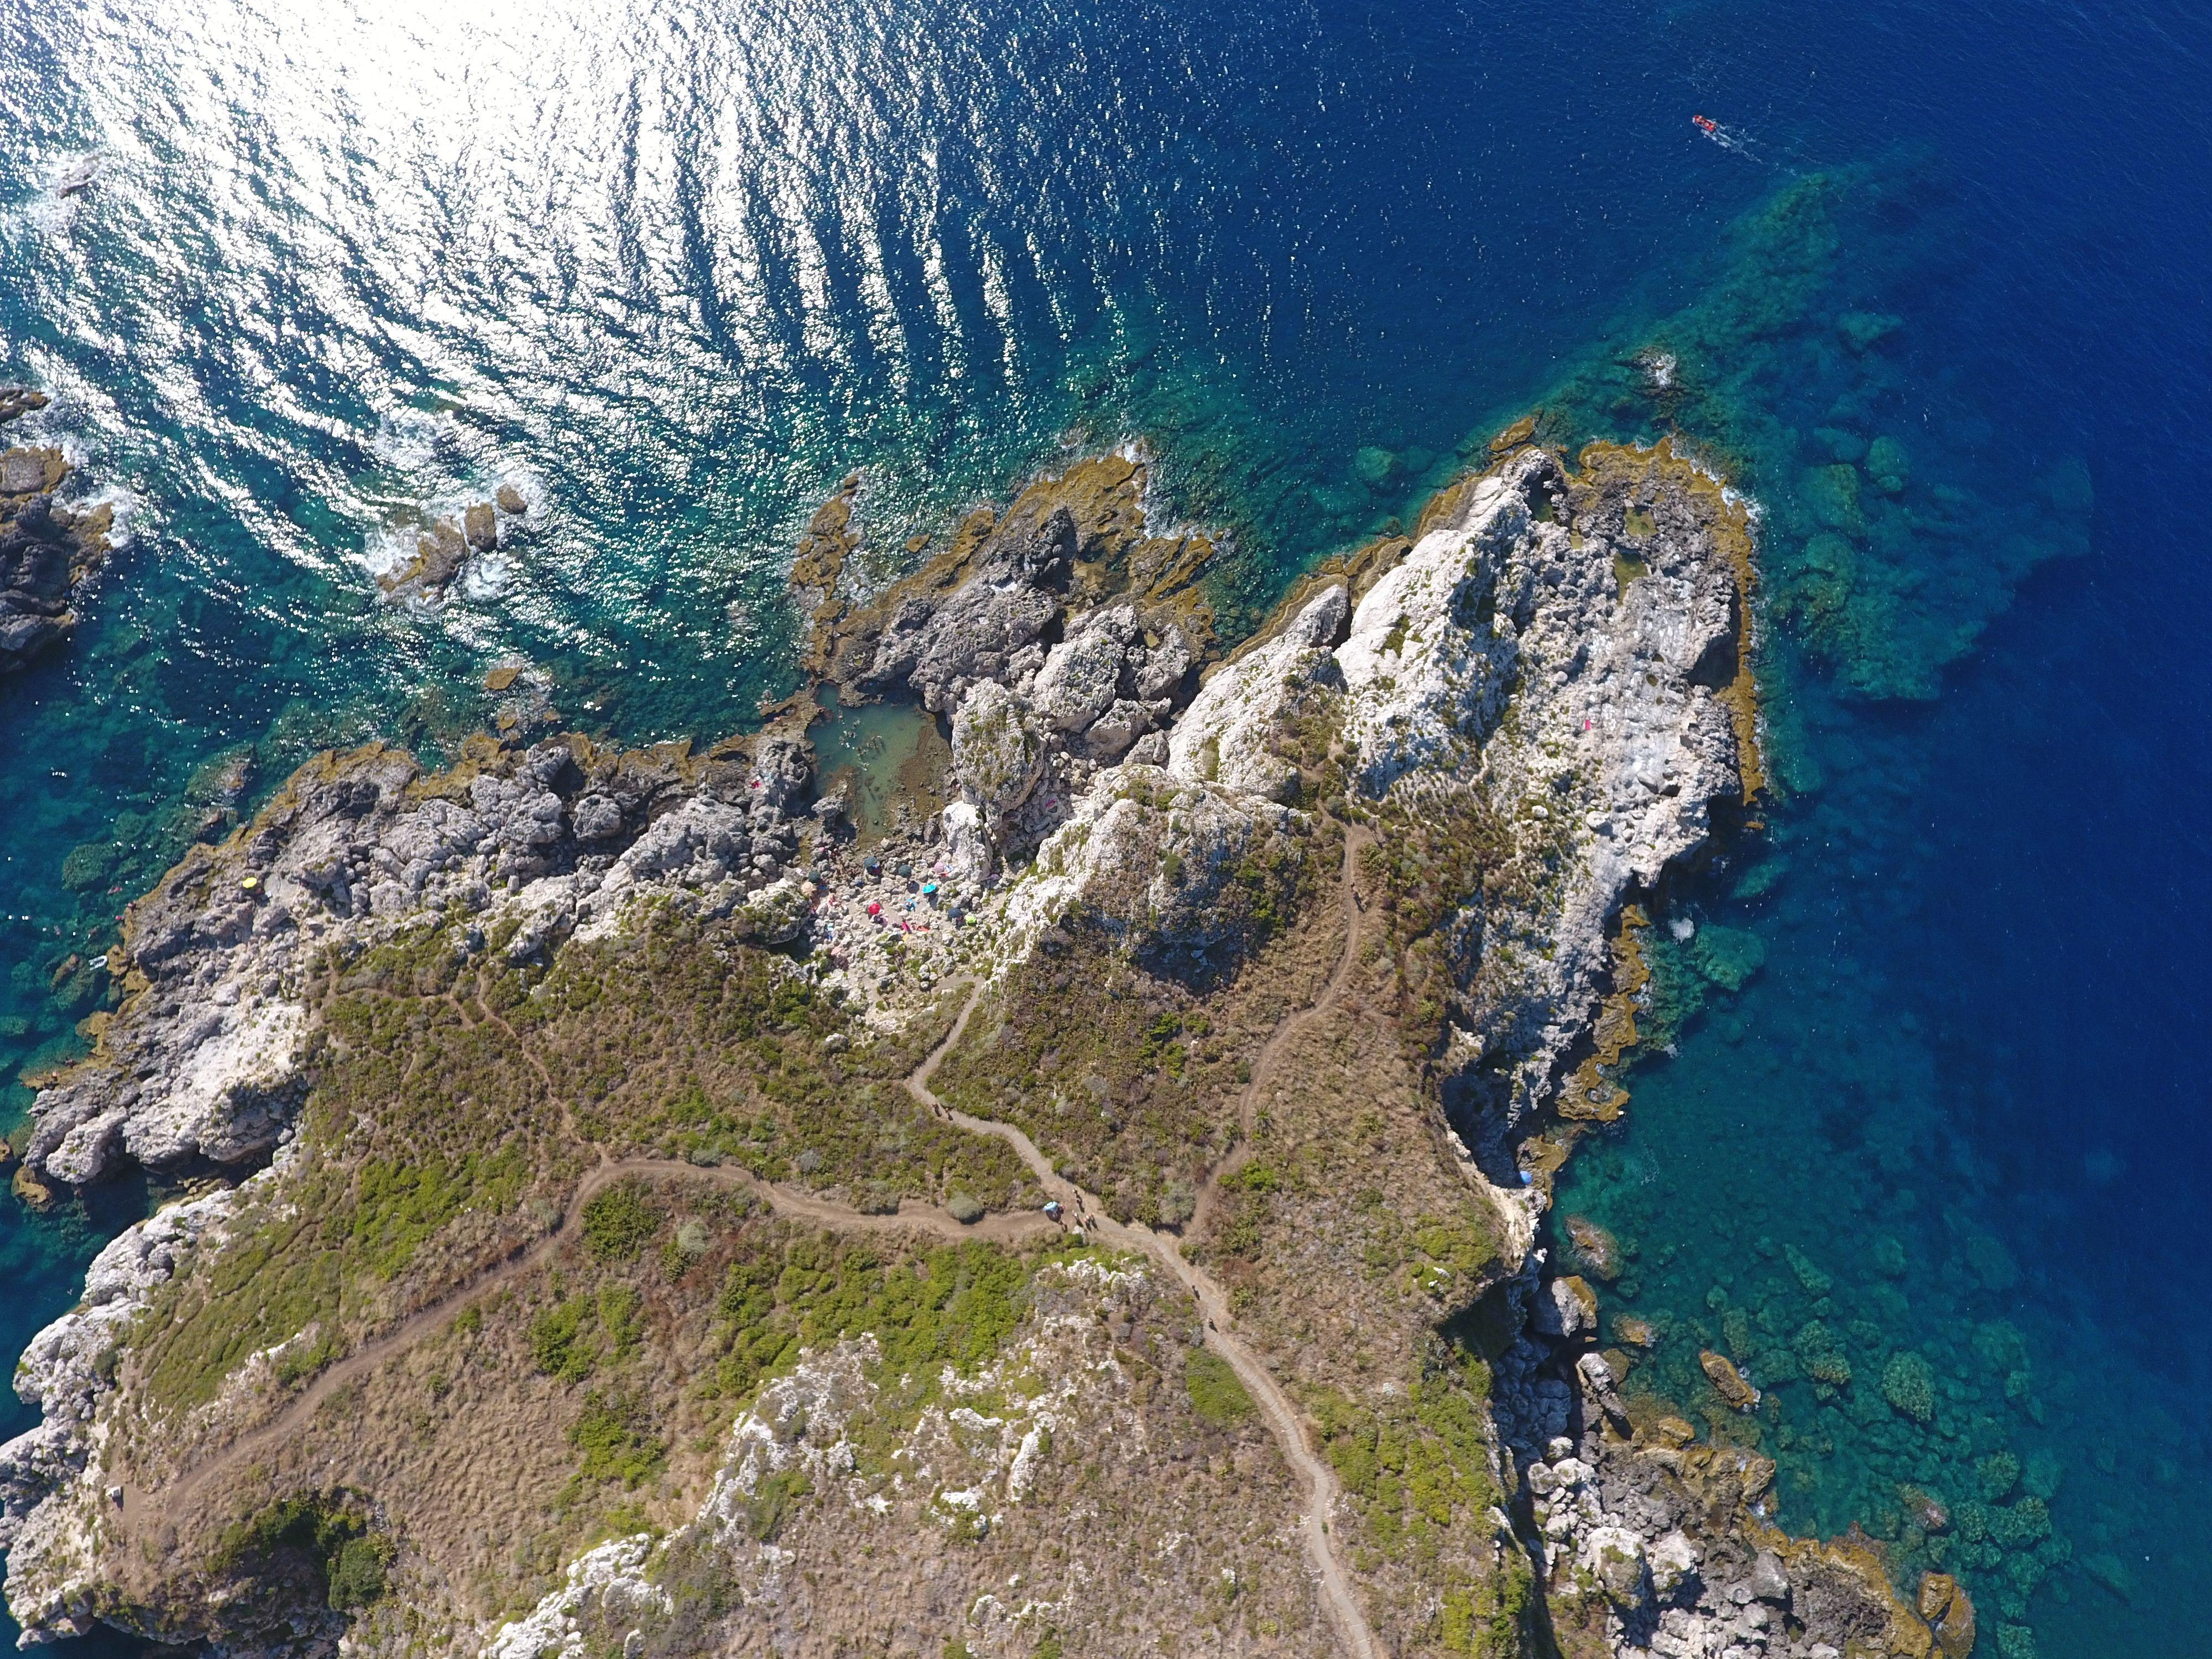 Piscina di Venere Naturschutzgebiet Sizilien in 2020